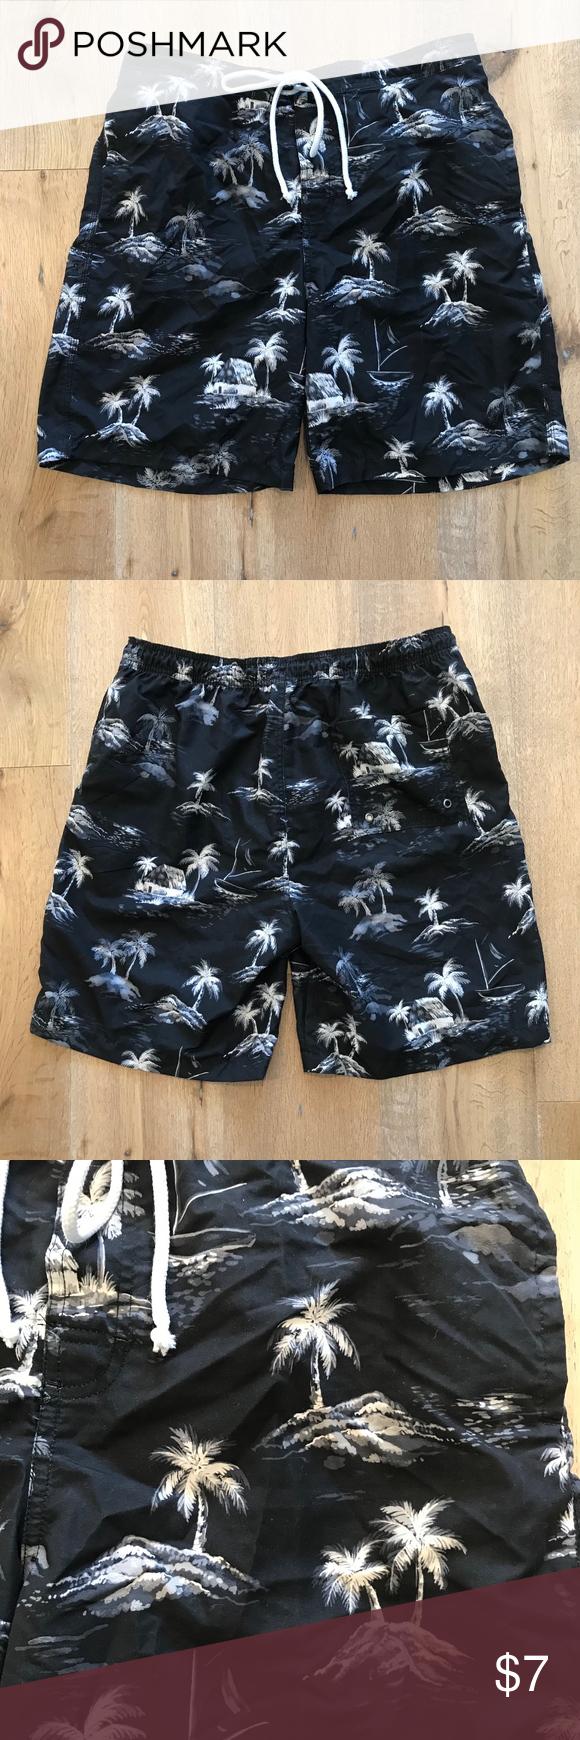 512f7f6442 Merona Island Palm Tree Beach Swim Trunks Target brand Merona bathing suit  swim for pool or